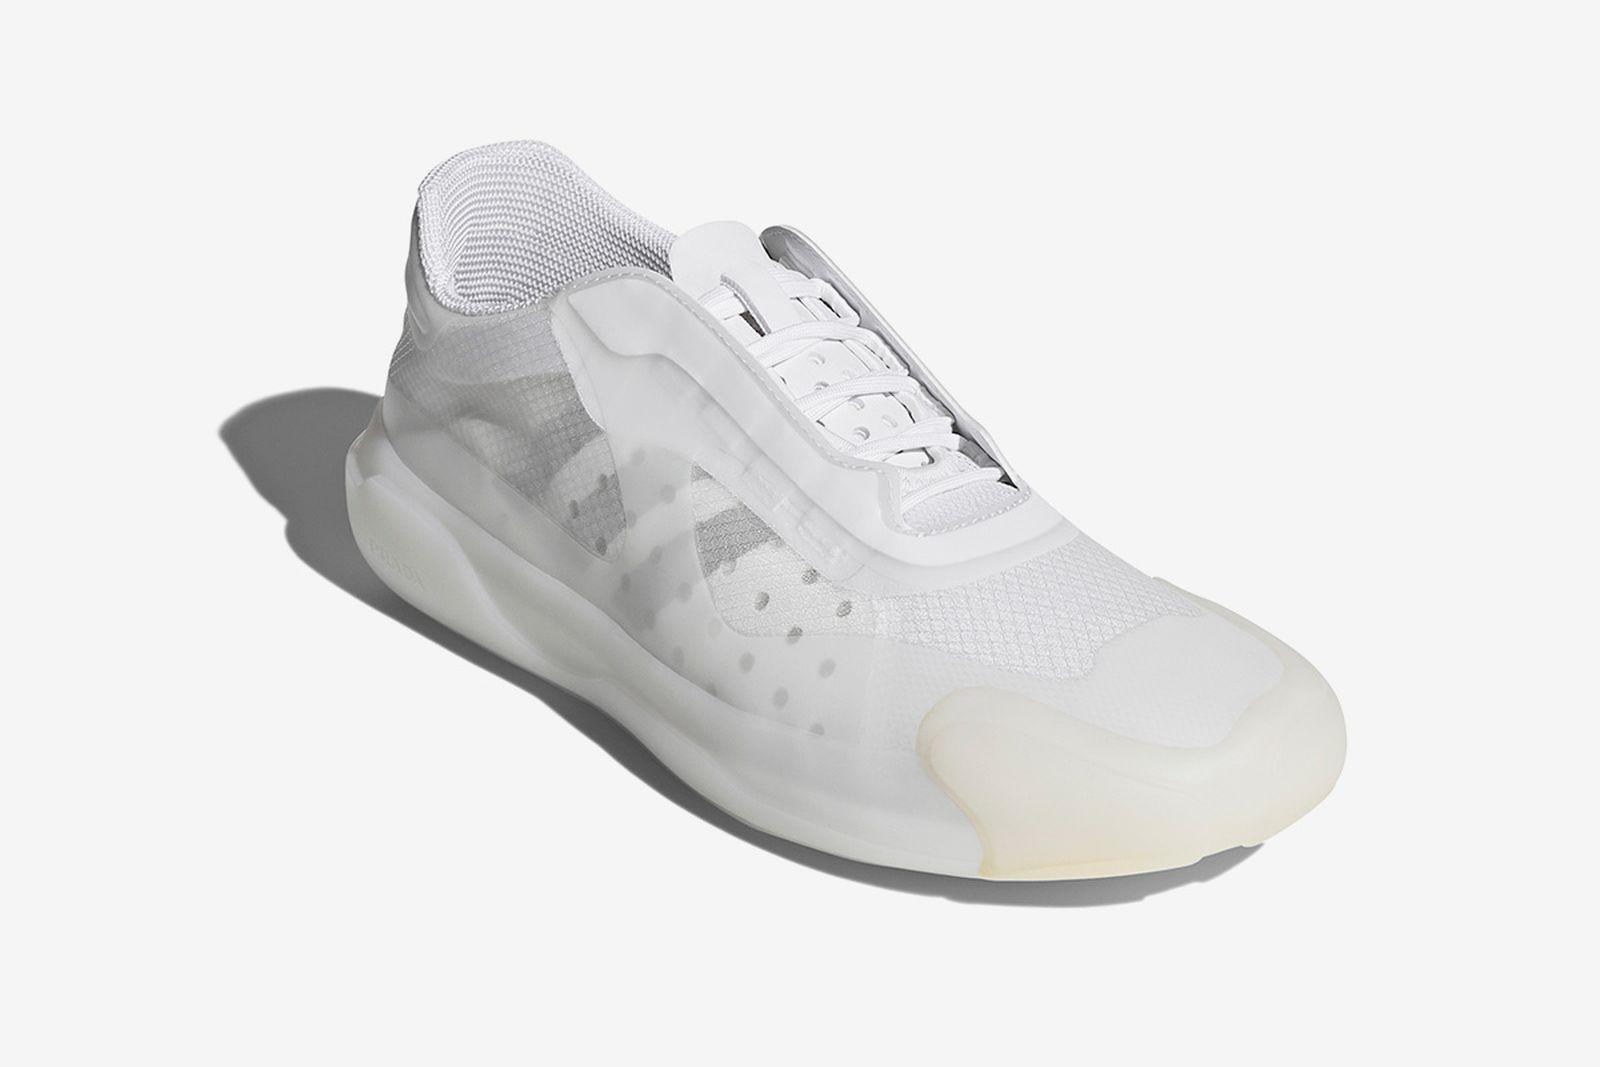 prada-adidas-ap-luna-rossa-21-release-date-price-04